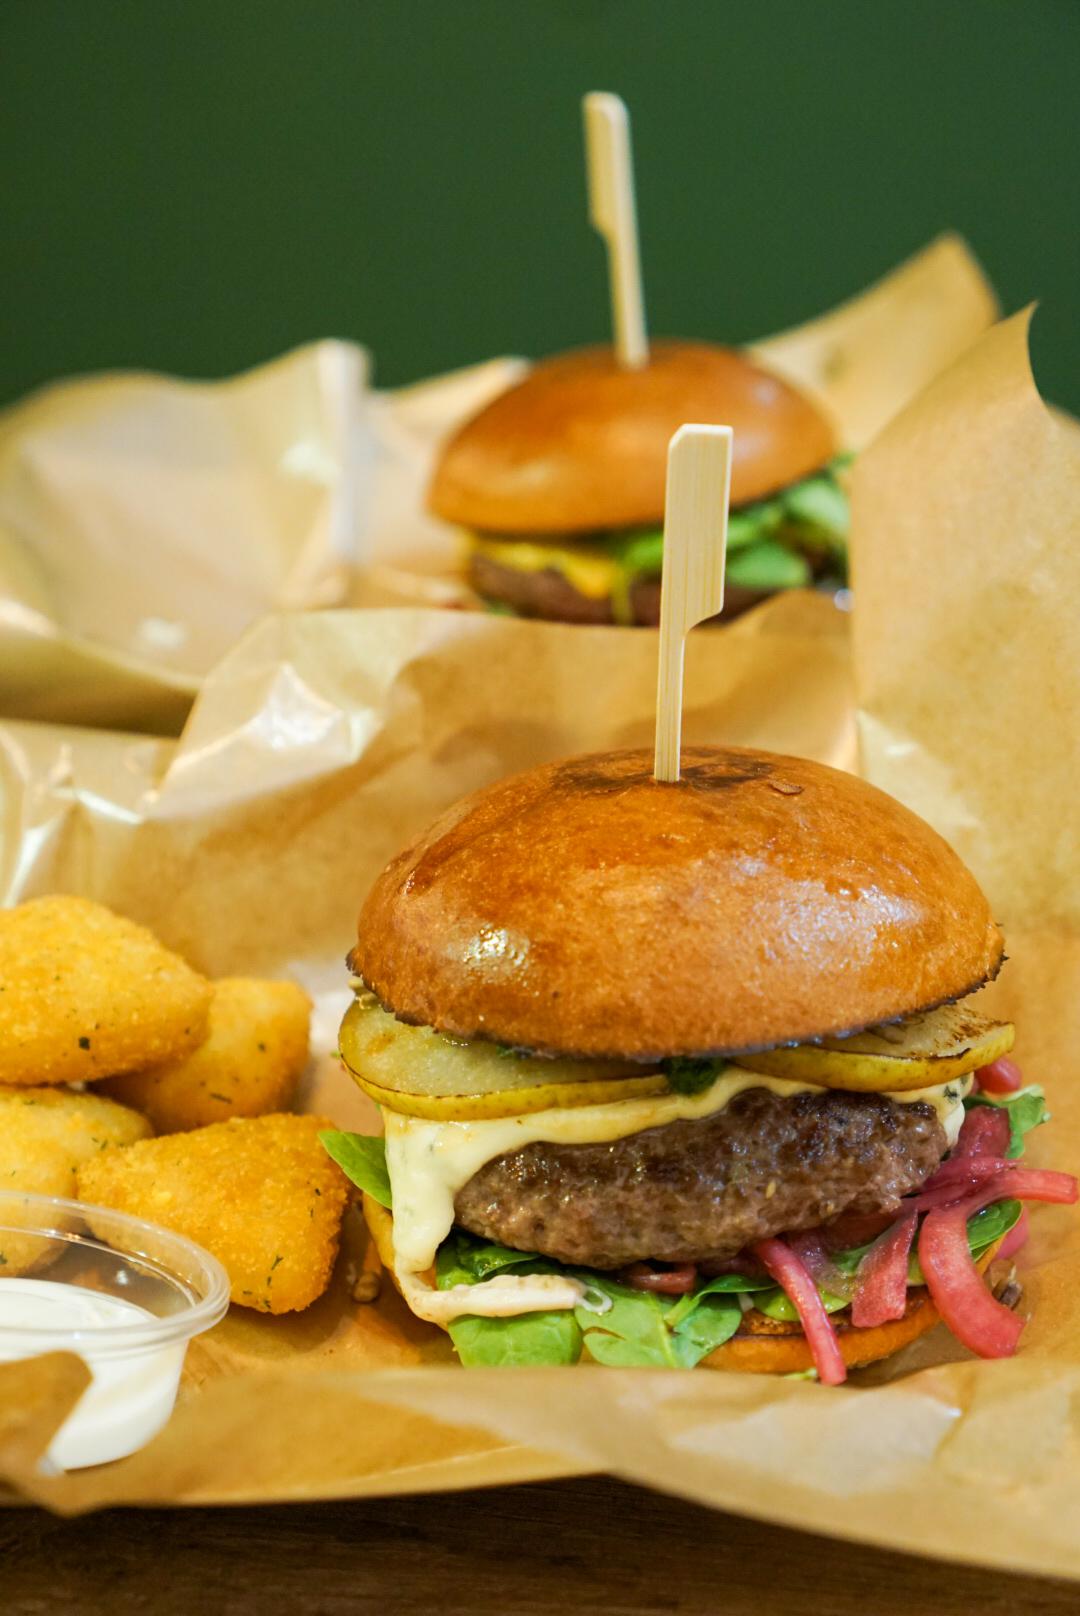 Black Cat Burgers - amerykański sen się spełnił!